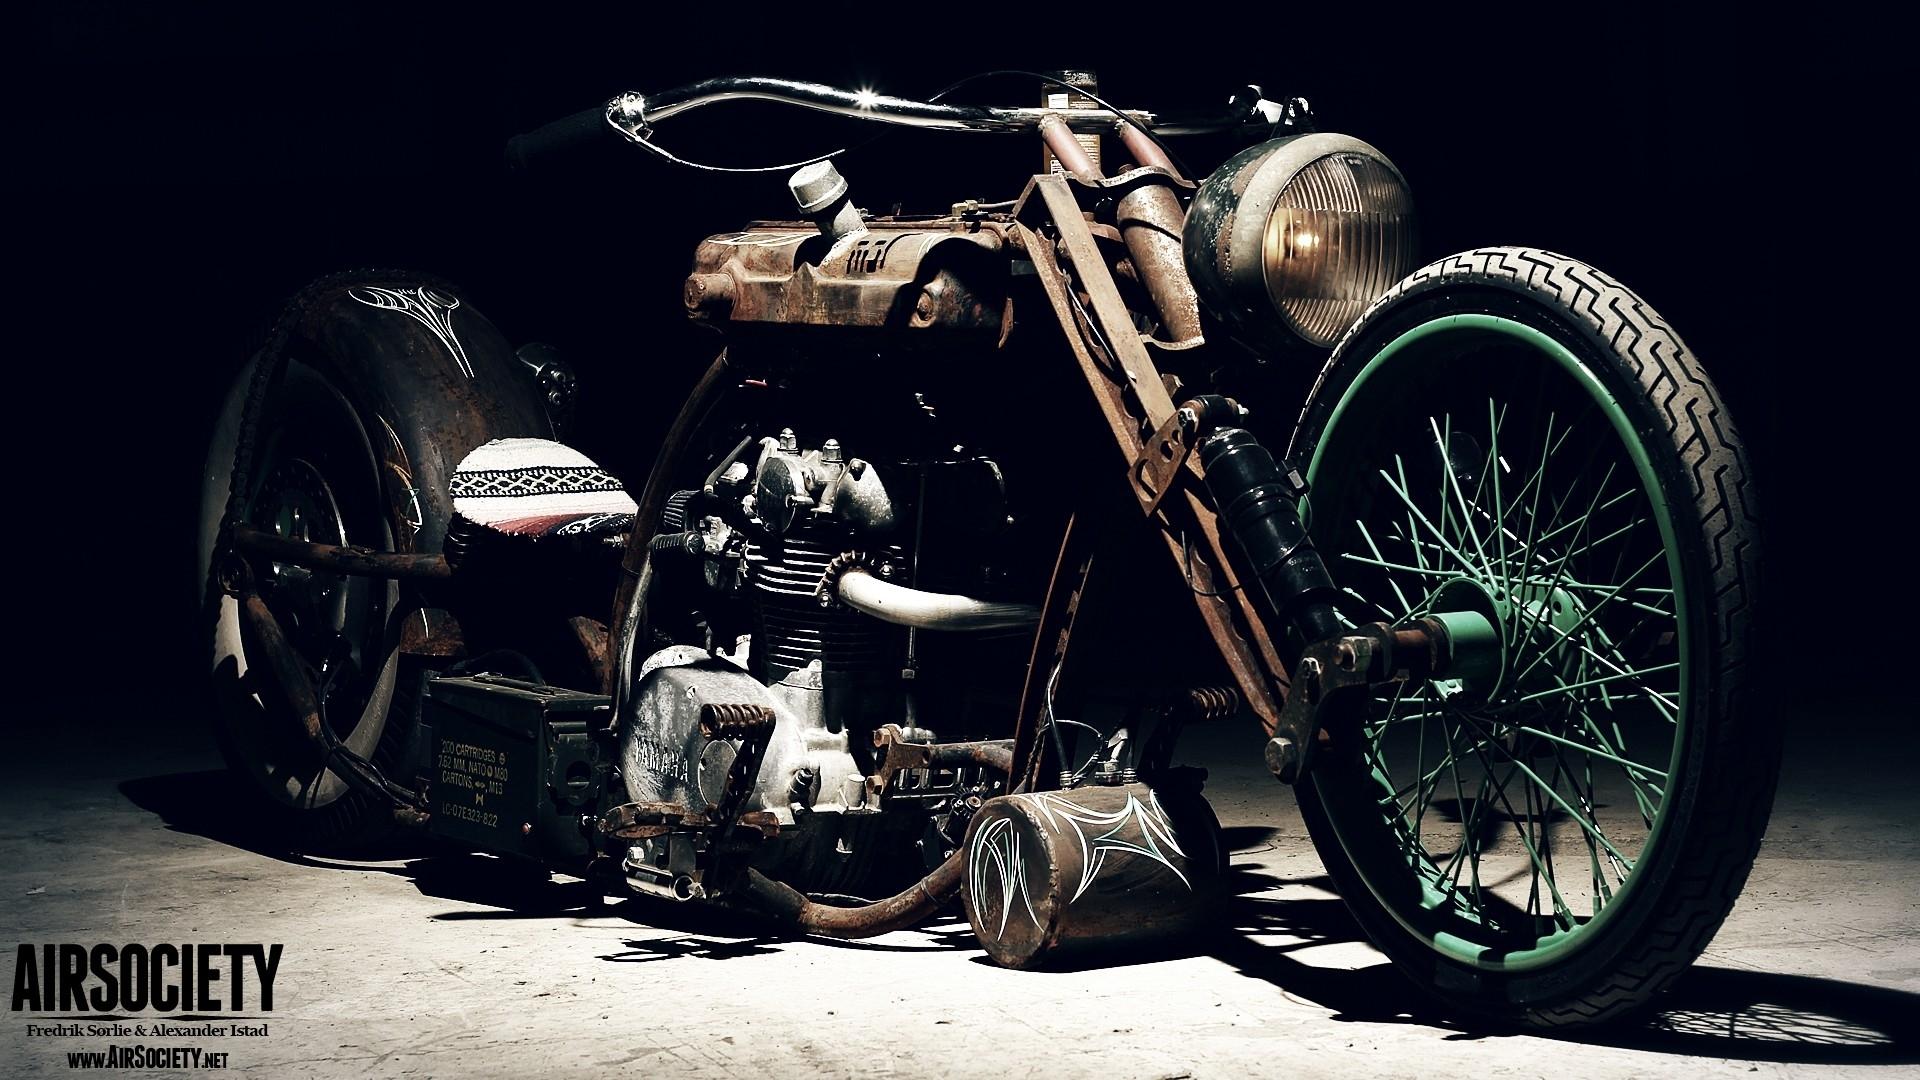 Bike custom chopper ride yamaha rust vehicles rats suspension 1920x1080